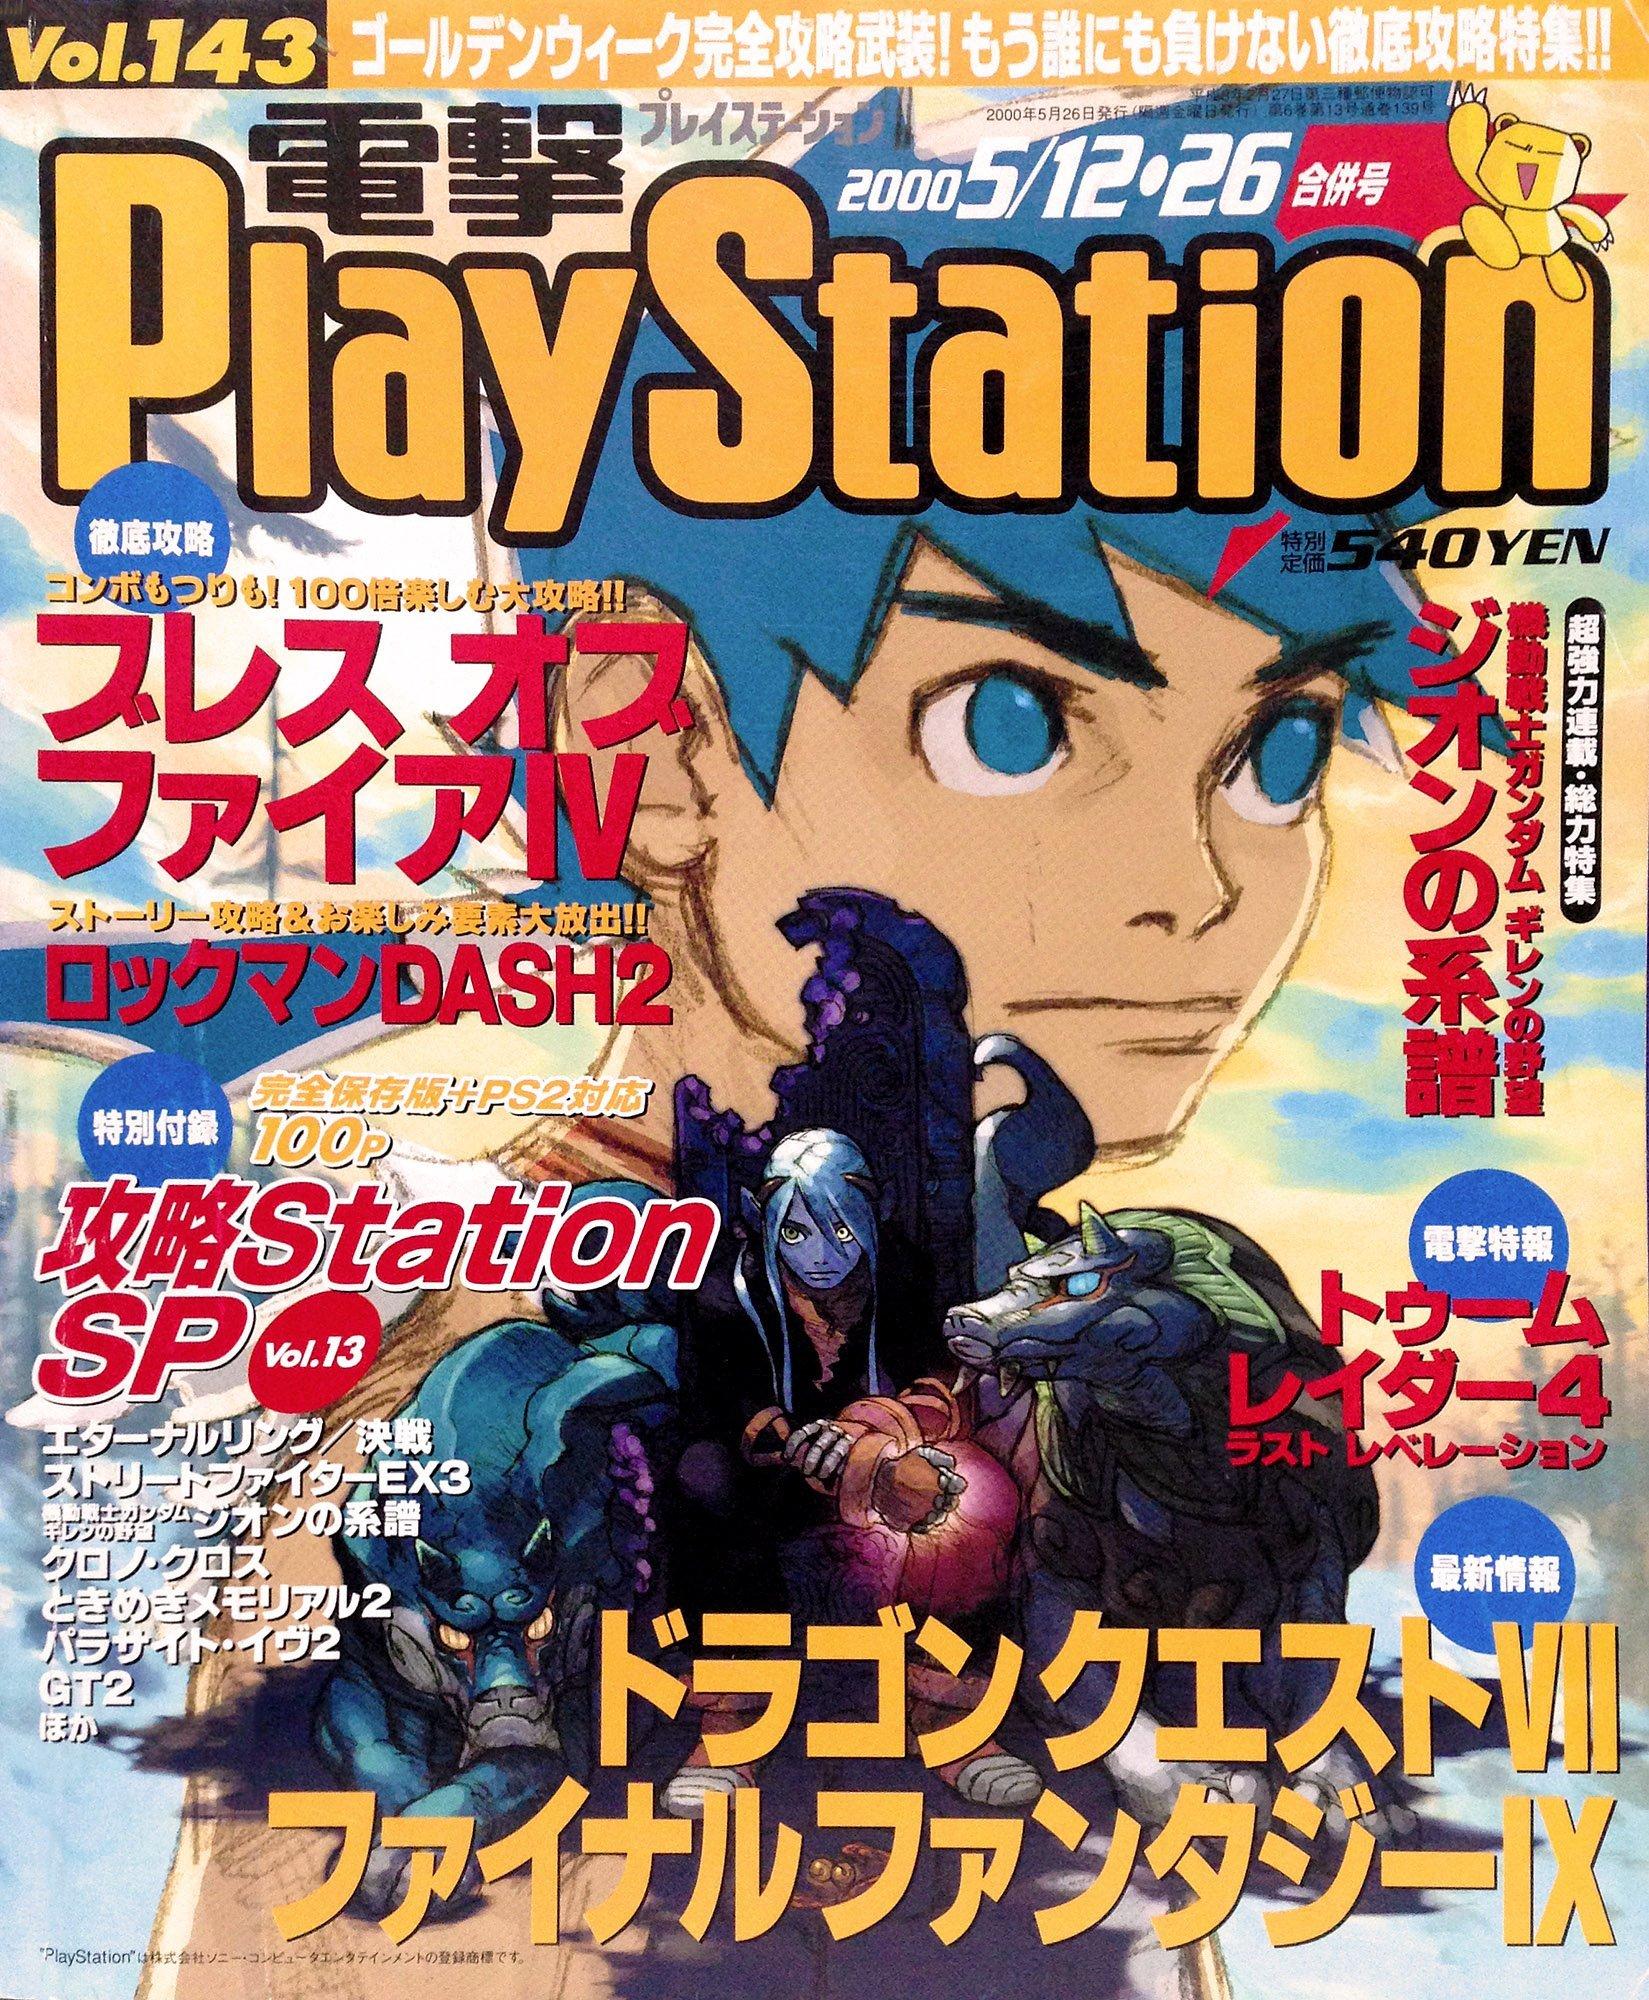 Dengeki PlayStation 143 (May 12/26, 2000)